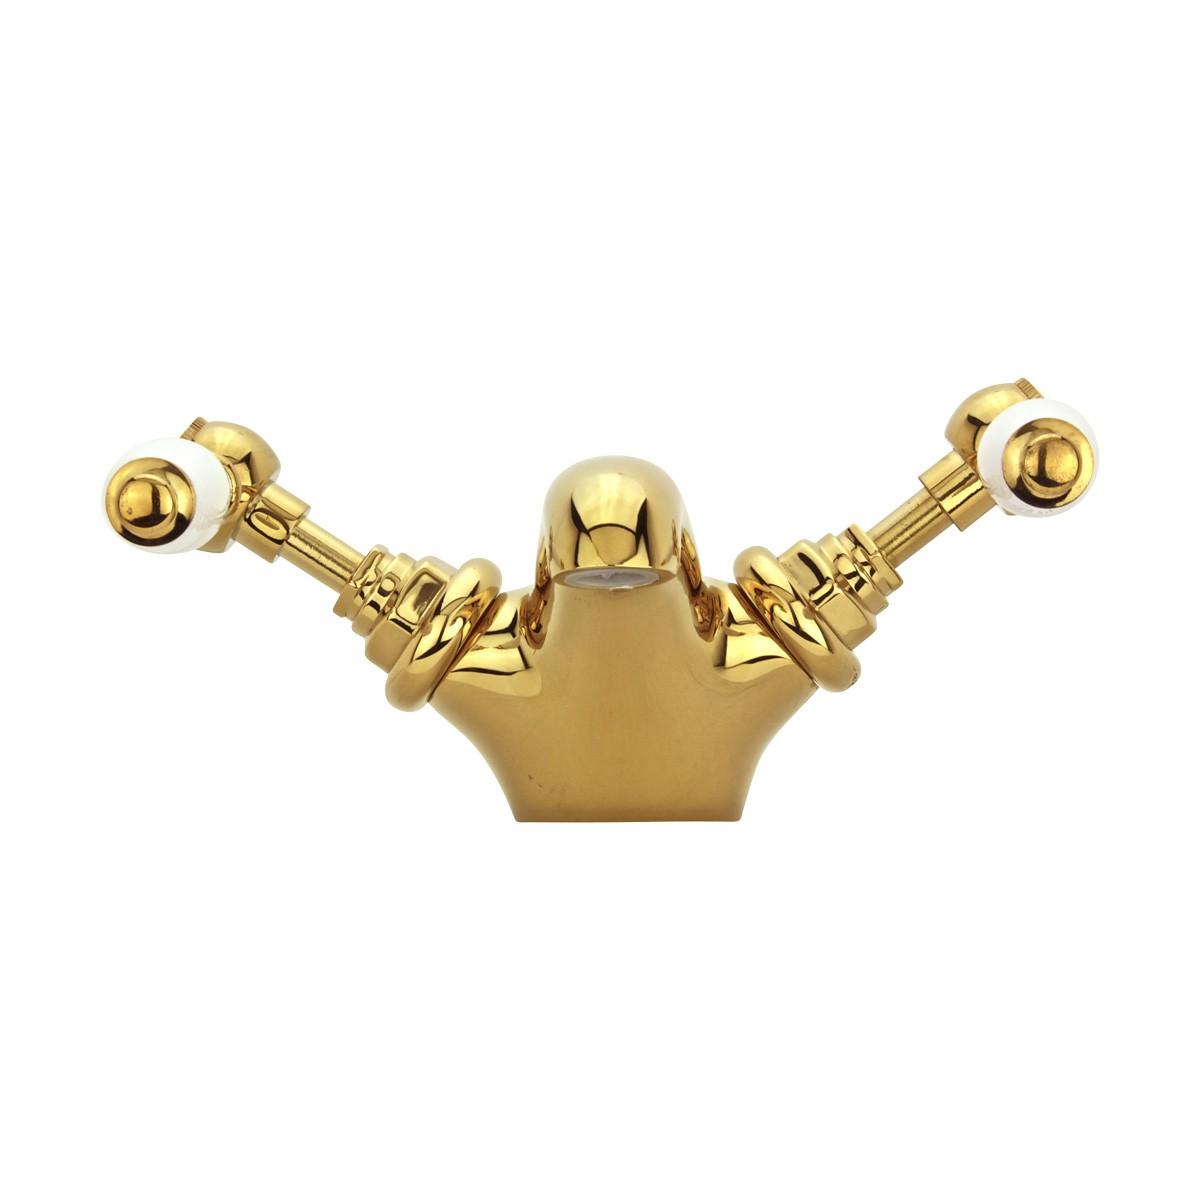 Bathroom Sink Faucet Single Hole Double Levers Gold PVD Faucets Bathroom Faucets Single Hole Faucet